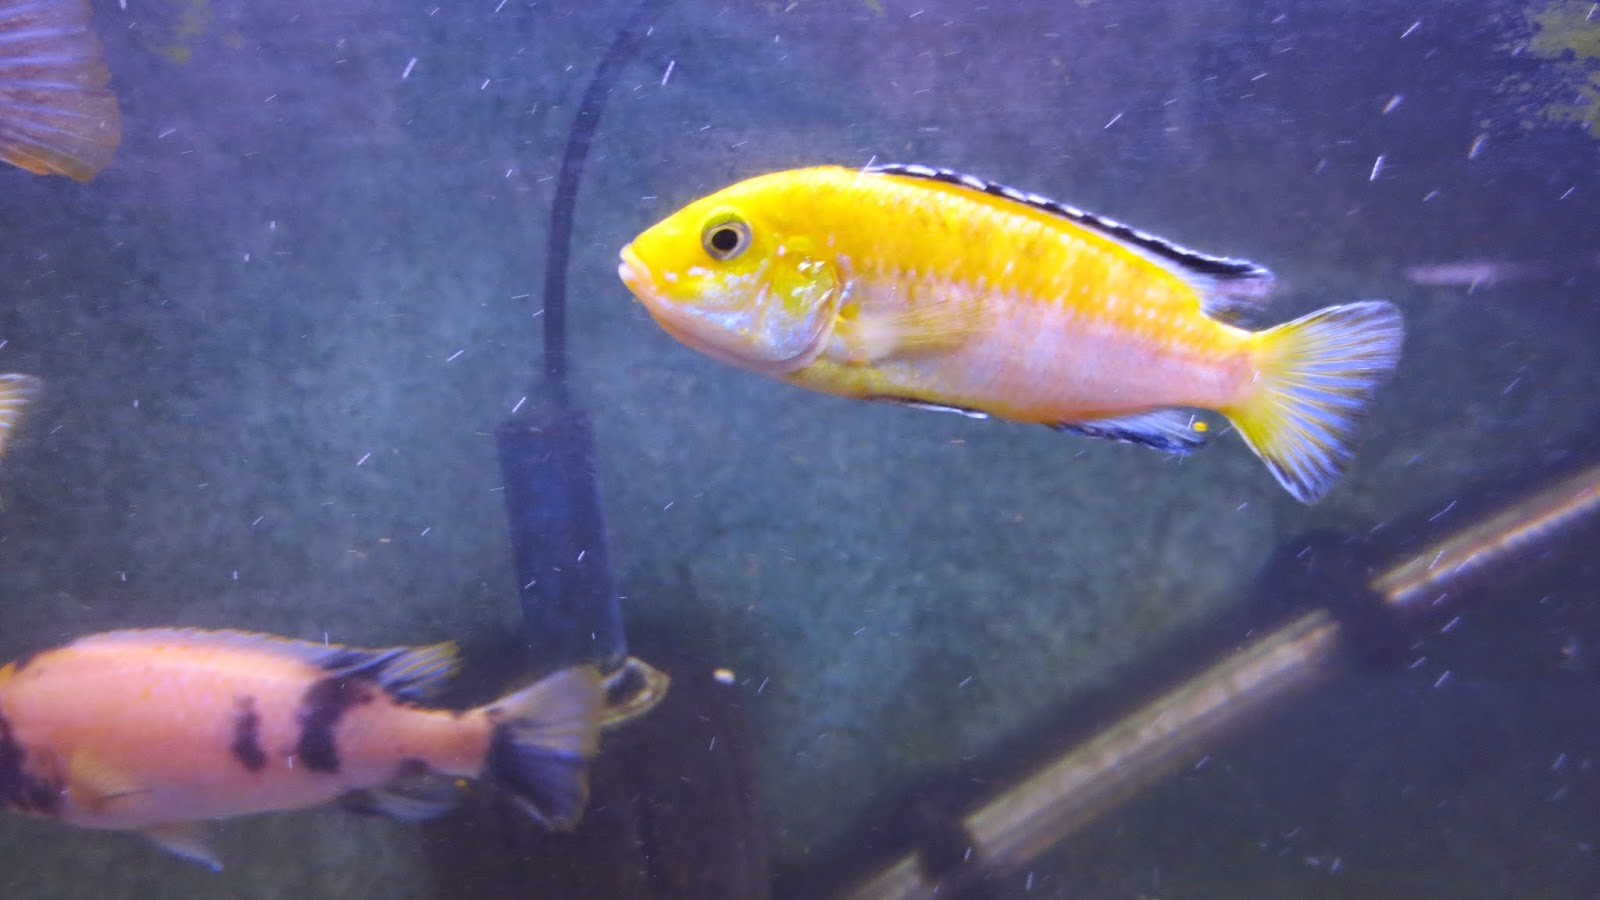 Mal tang fish labidochromis caeruleus yellow lab 8 27 14 for Blue fish cove